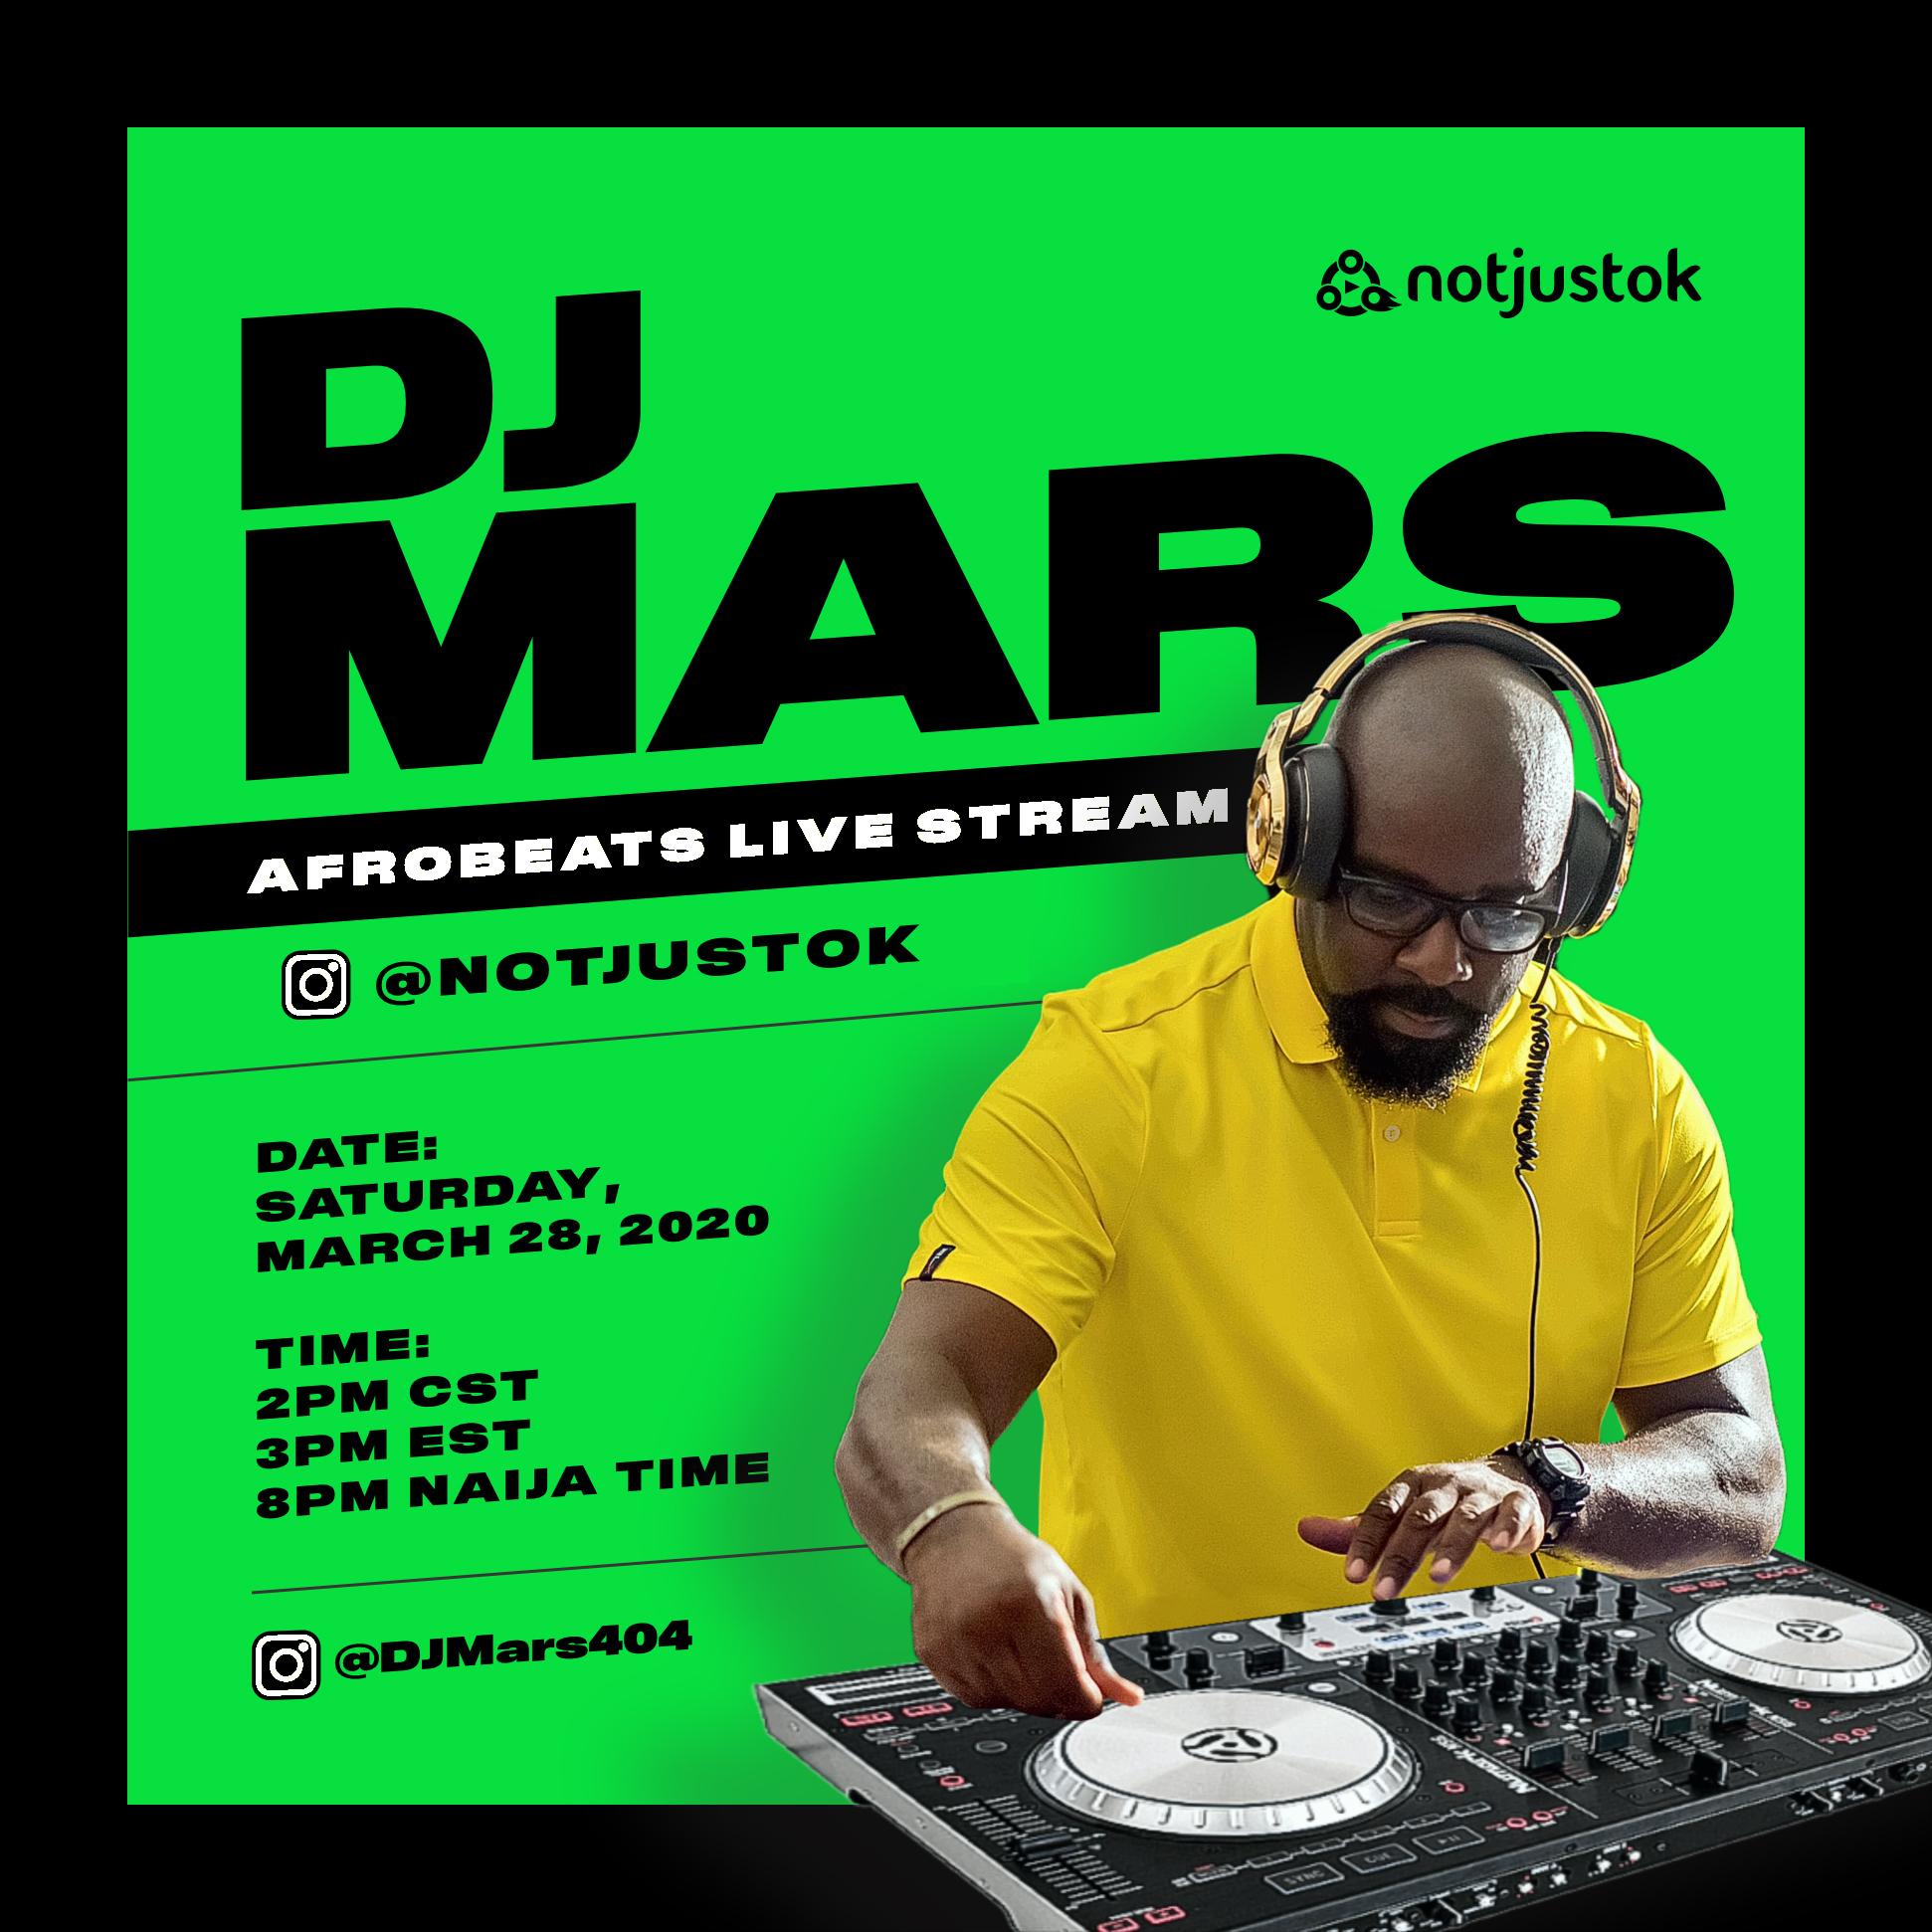 DJ Mars To Host Afrobeats Set LIVE on IG: @NOTJUSTOK This Saturday